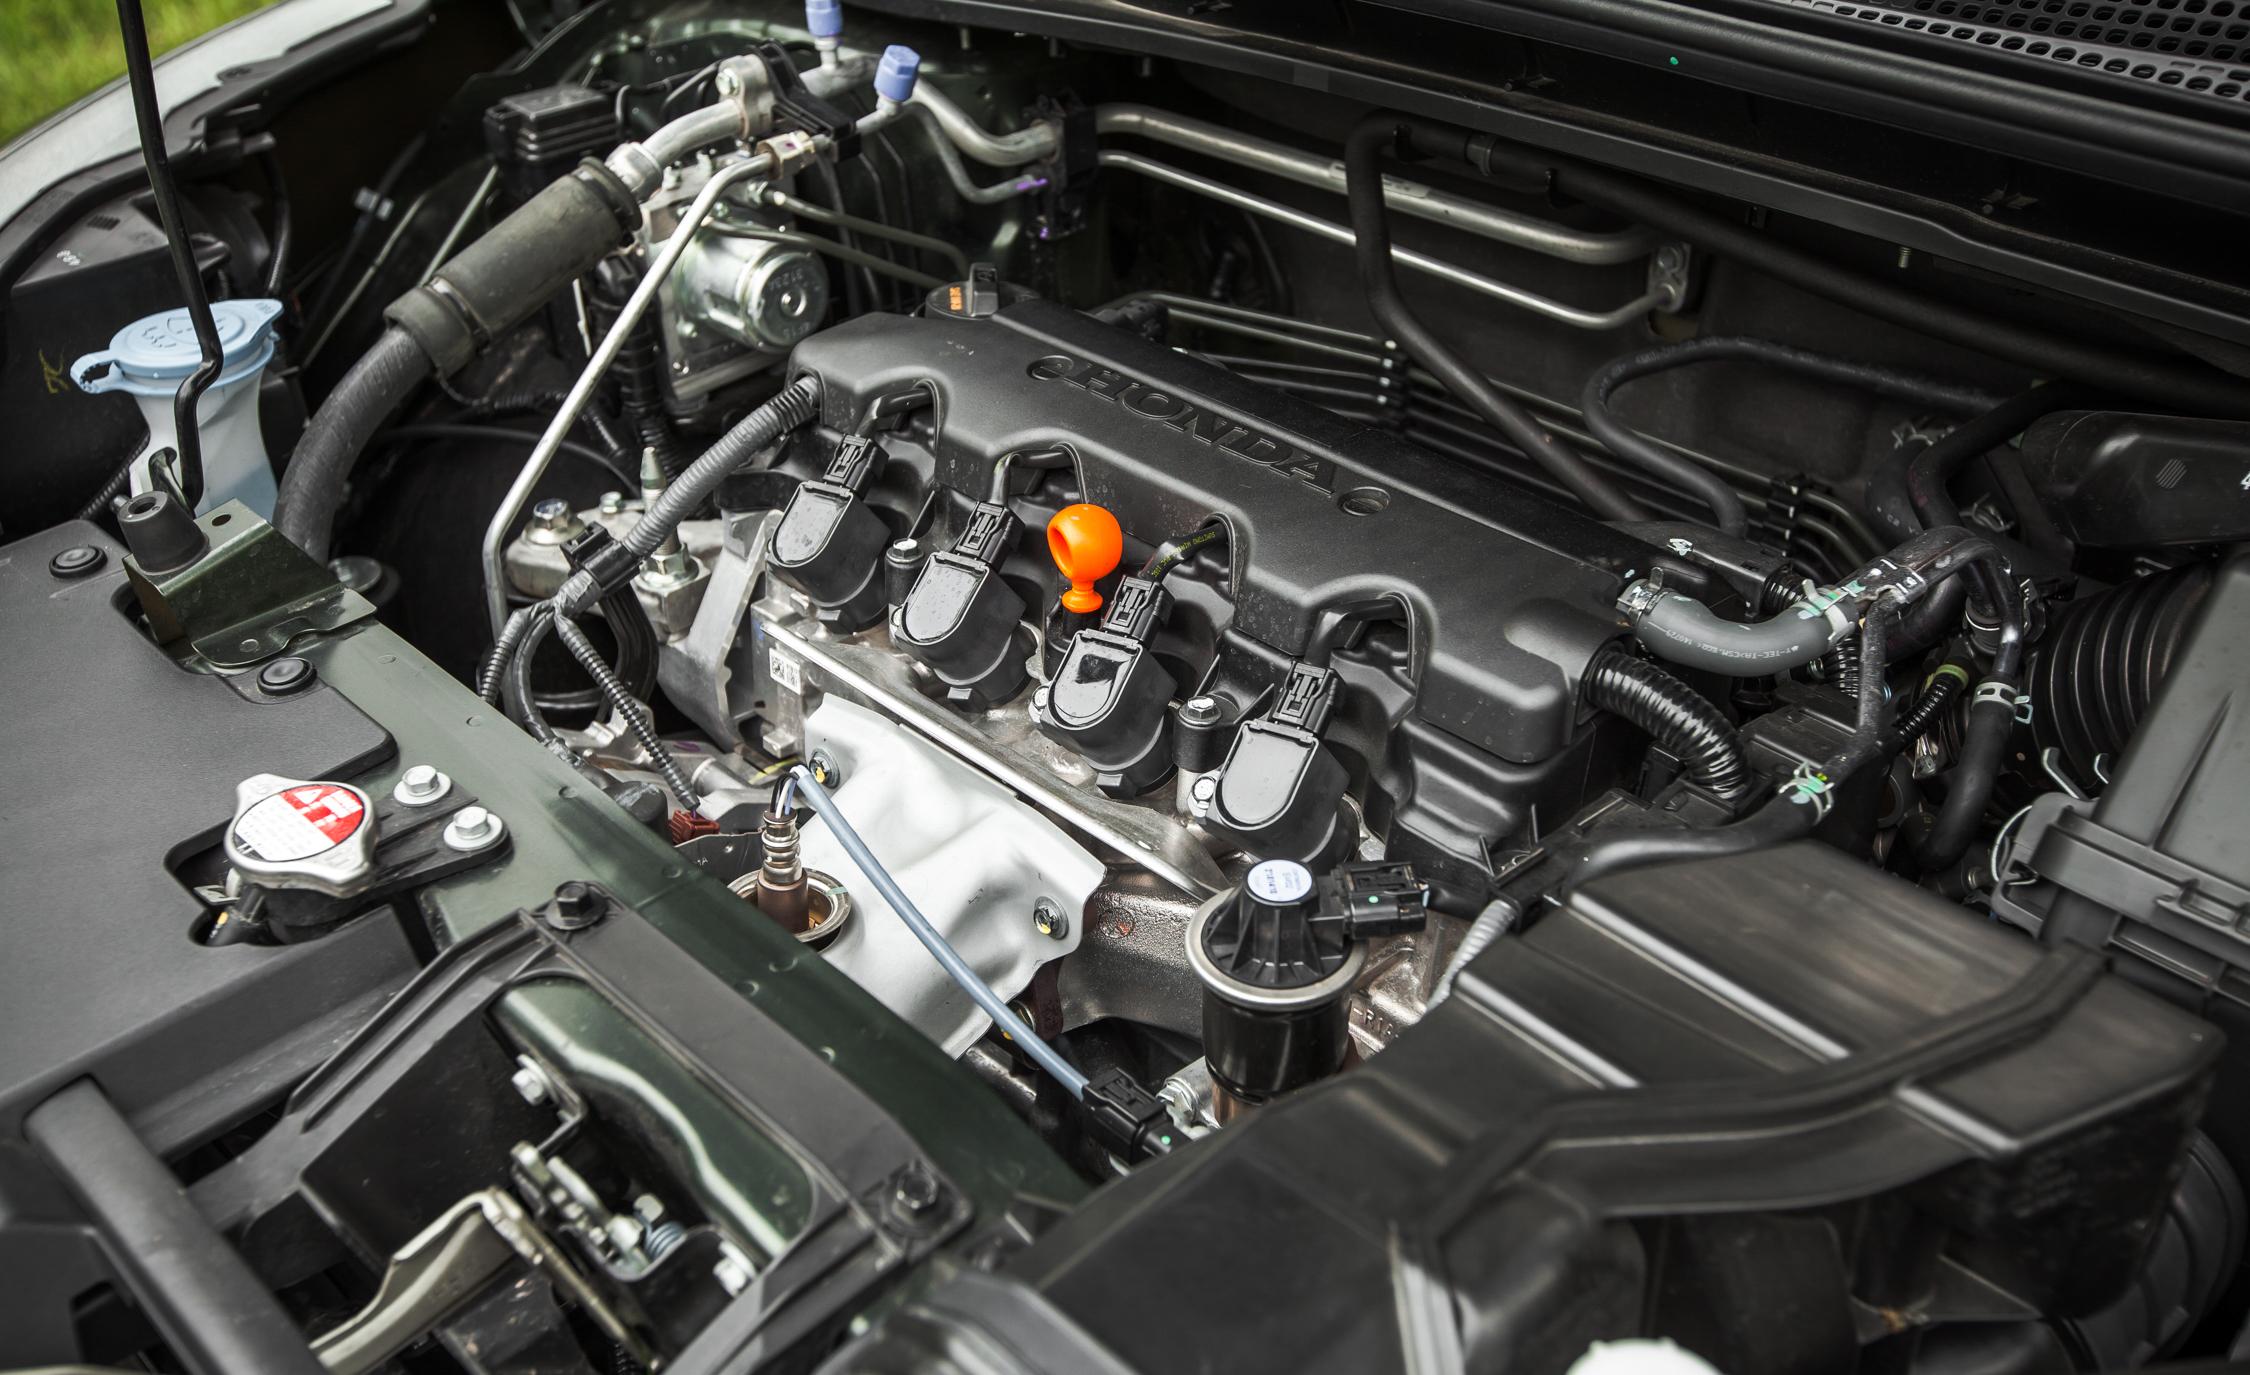 2016 Honda HR-V 1.8-Liter Inline-4 Engine